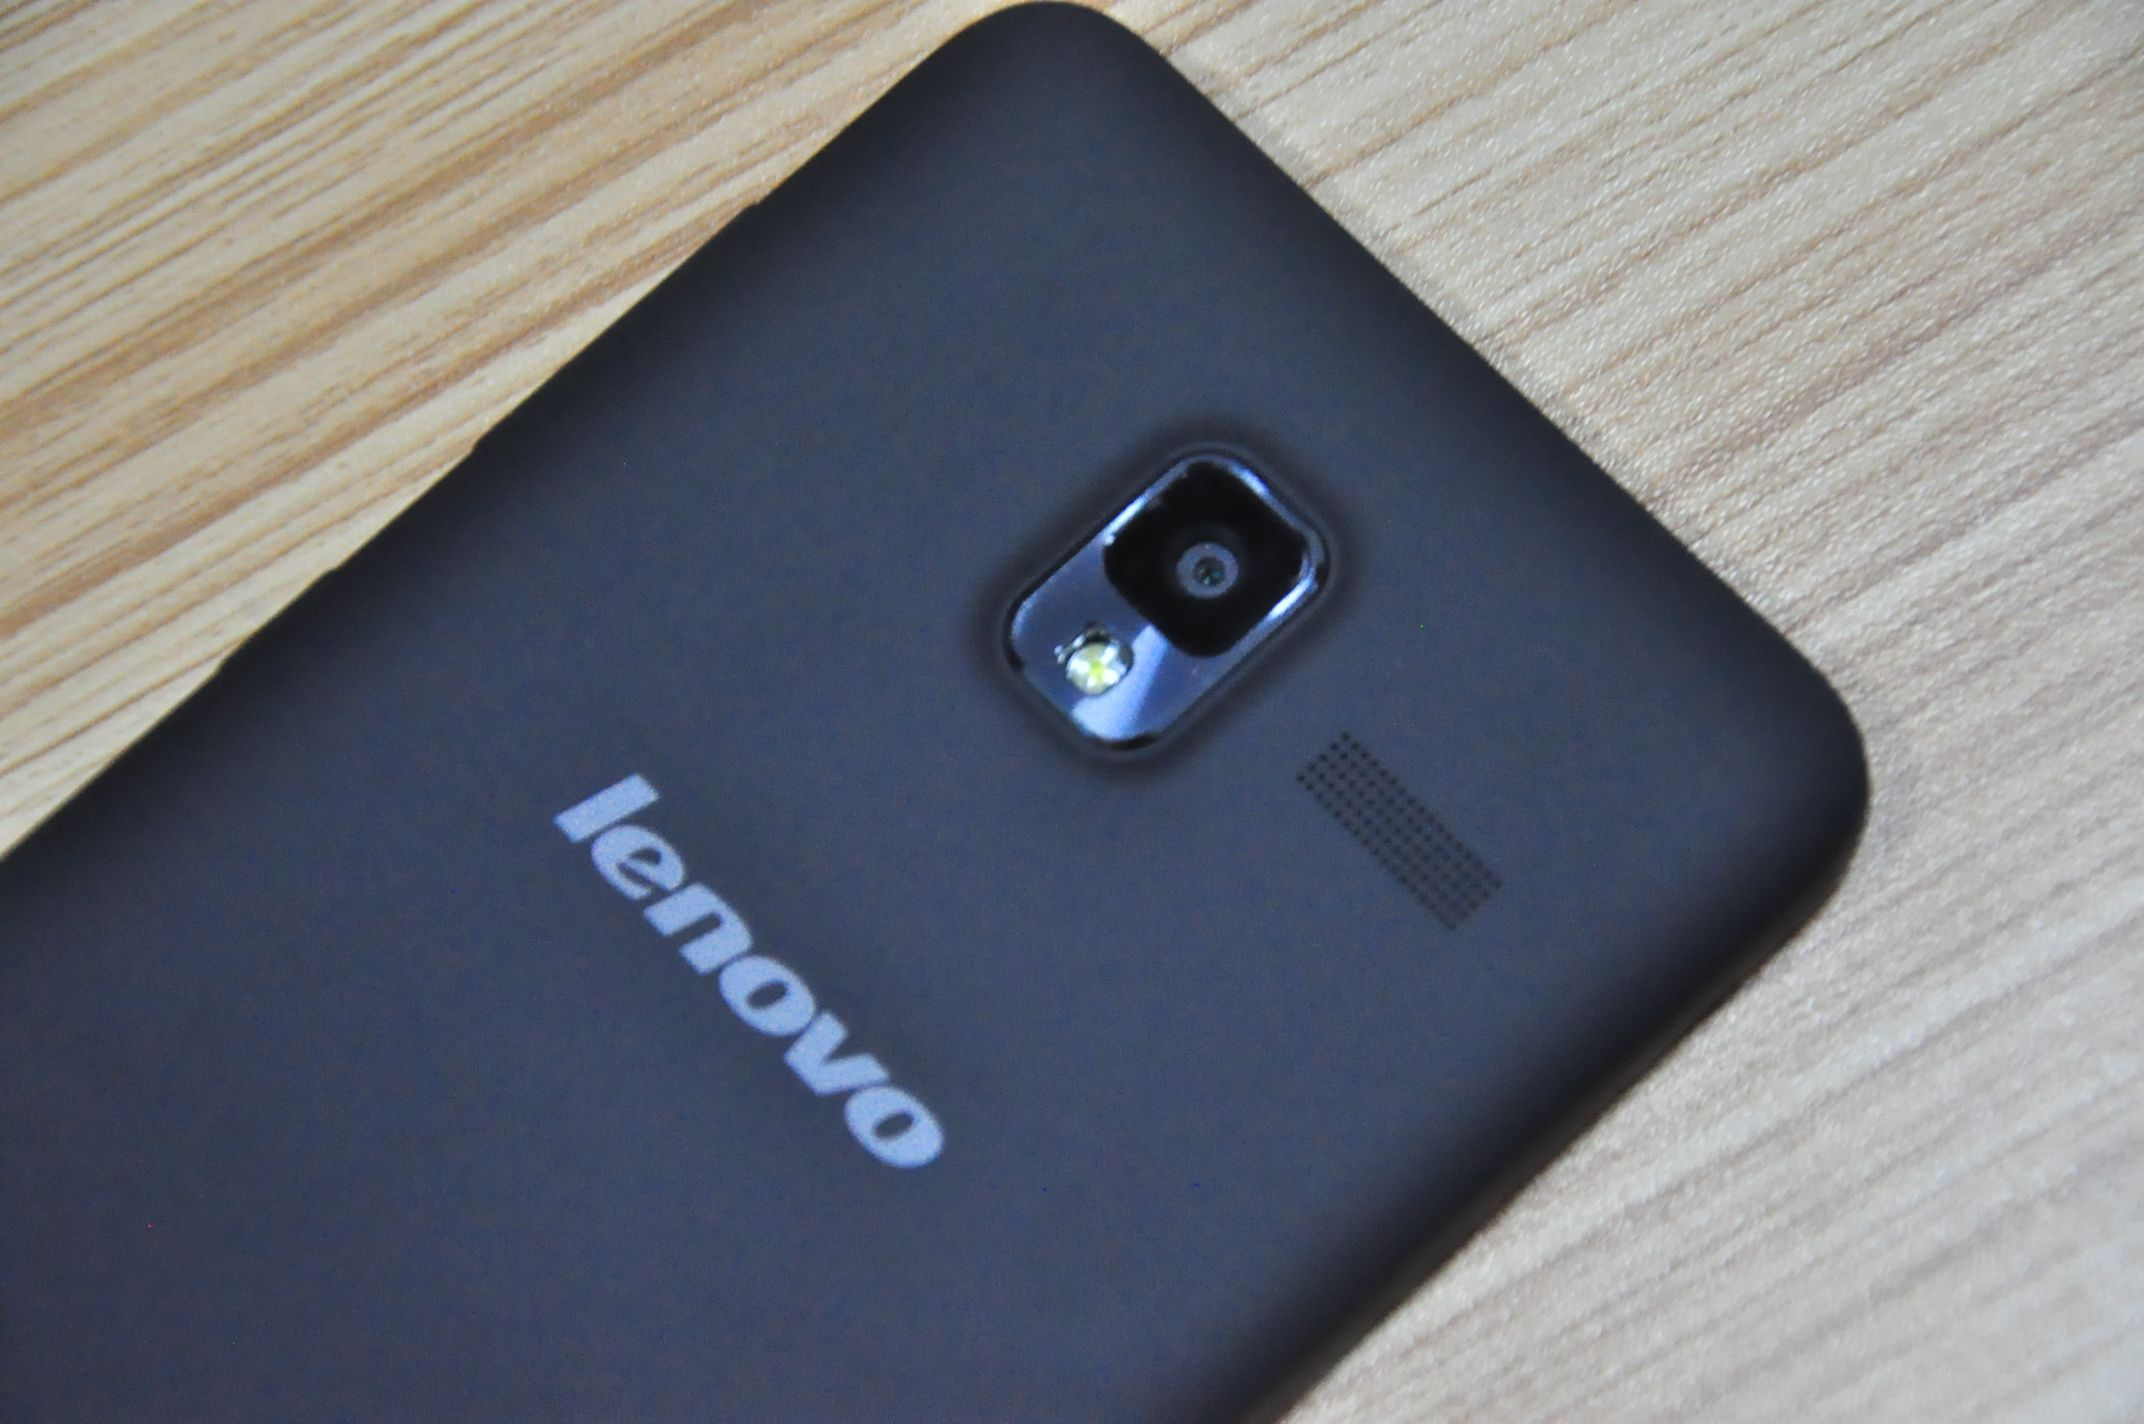 Lenovo A850+ SmartPhone MTK6592 Octa Core 1 4GHz Dual Sim 3G WCDMA